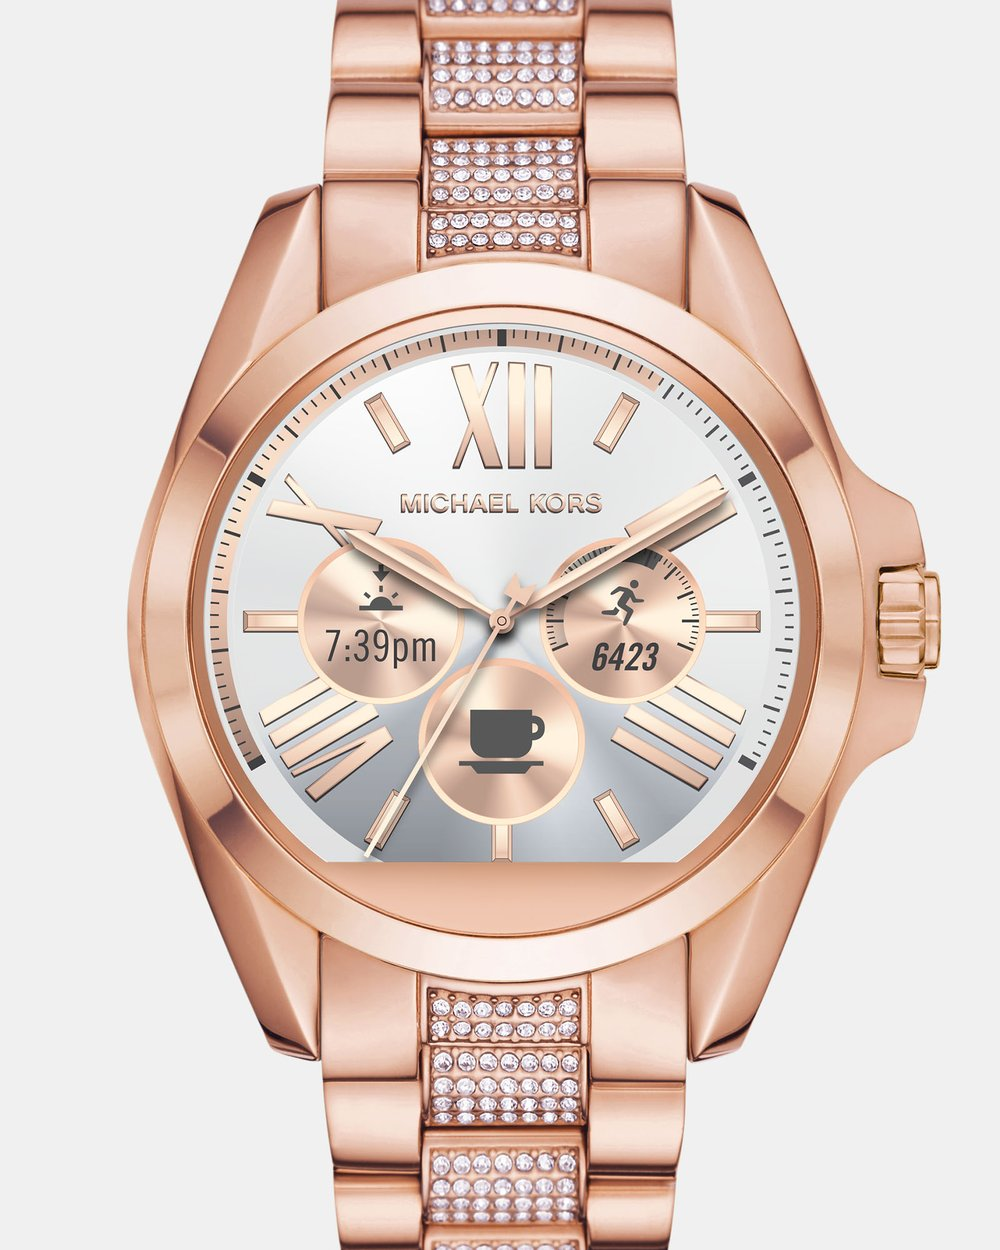 44a514611899 Smartwatch Bradshaw Rose Gold-Tone by Michael Kors Online